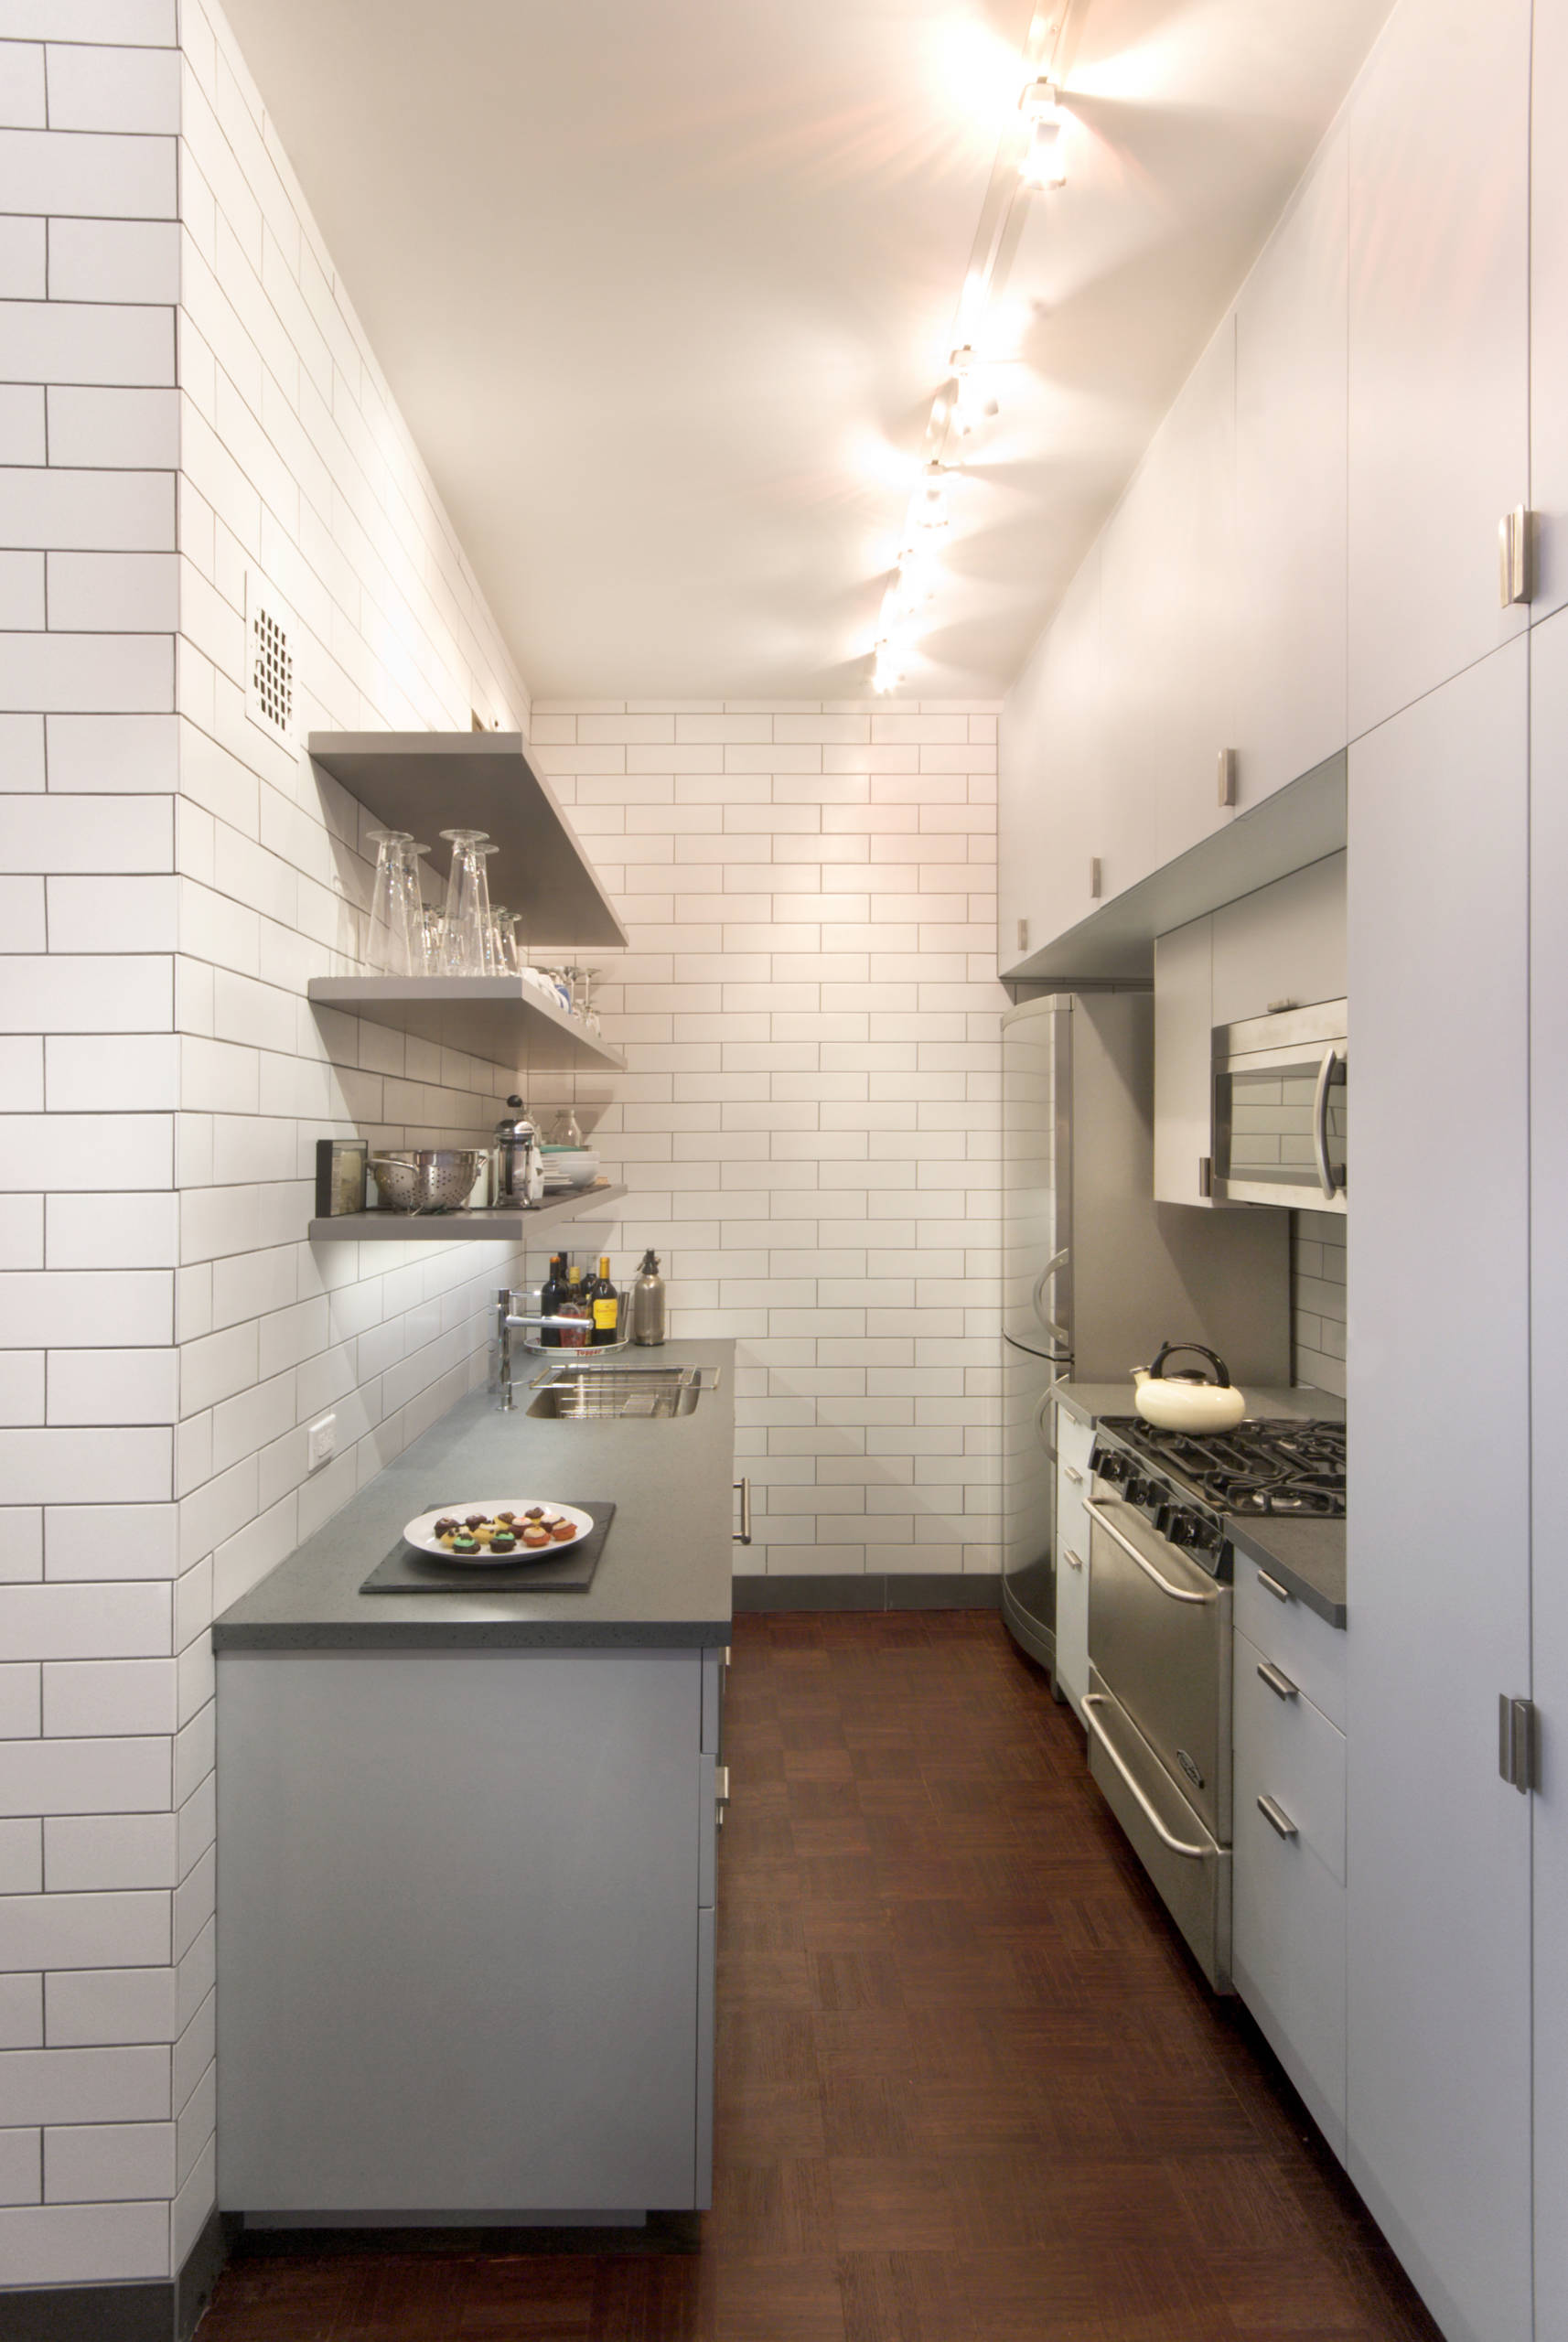 5 X 10 Kitchen Ideas Photos Houzz